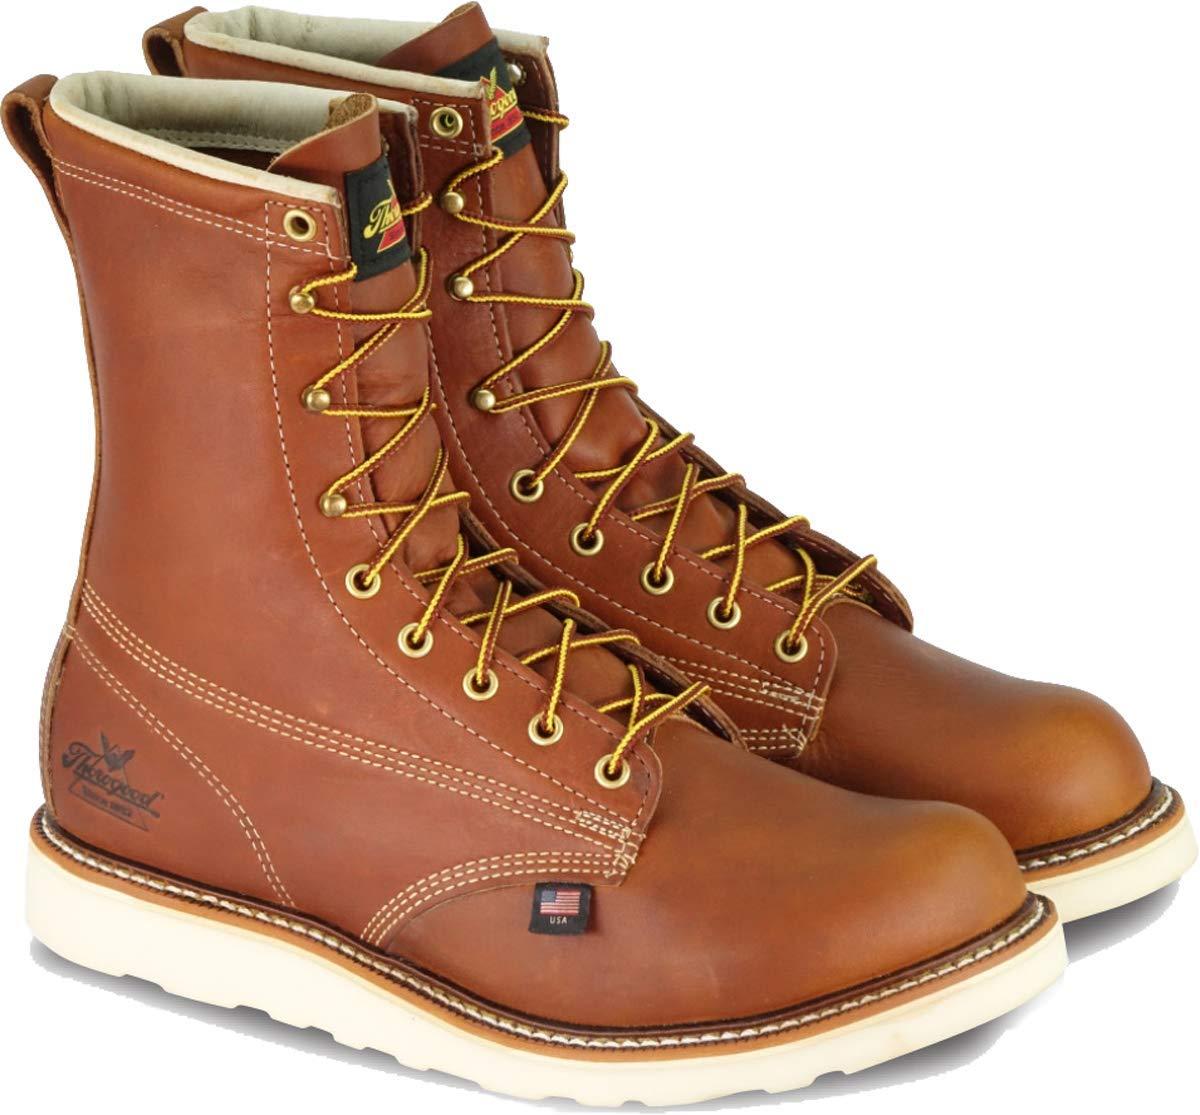 "Thorogood Men's American Heritage 8"" Round Toe, MAXWear Wedge Safety Toe Boot"